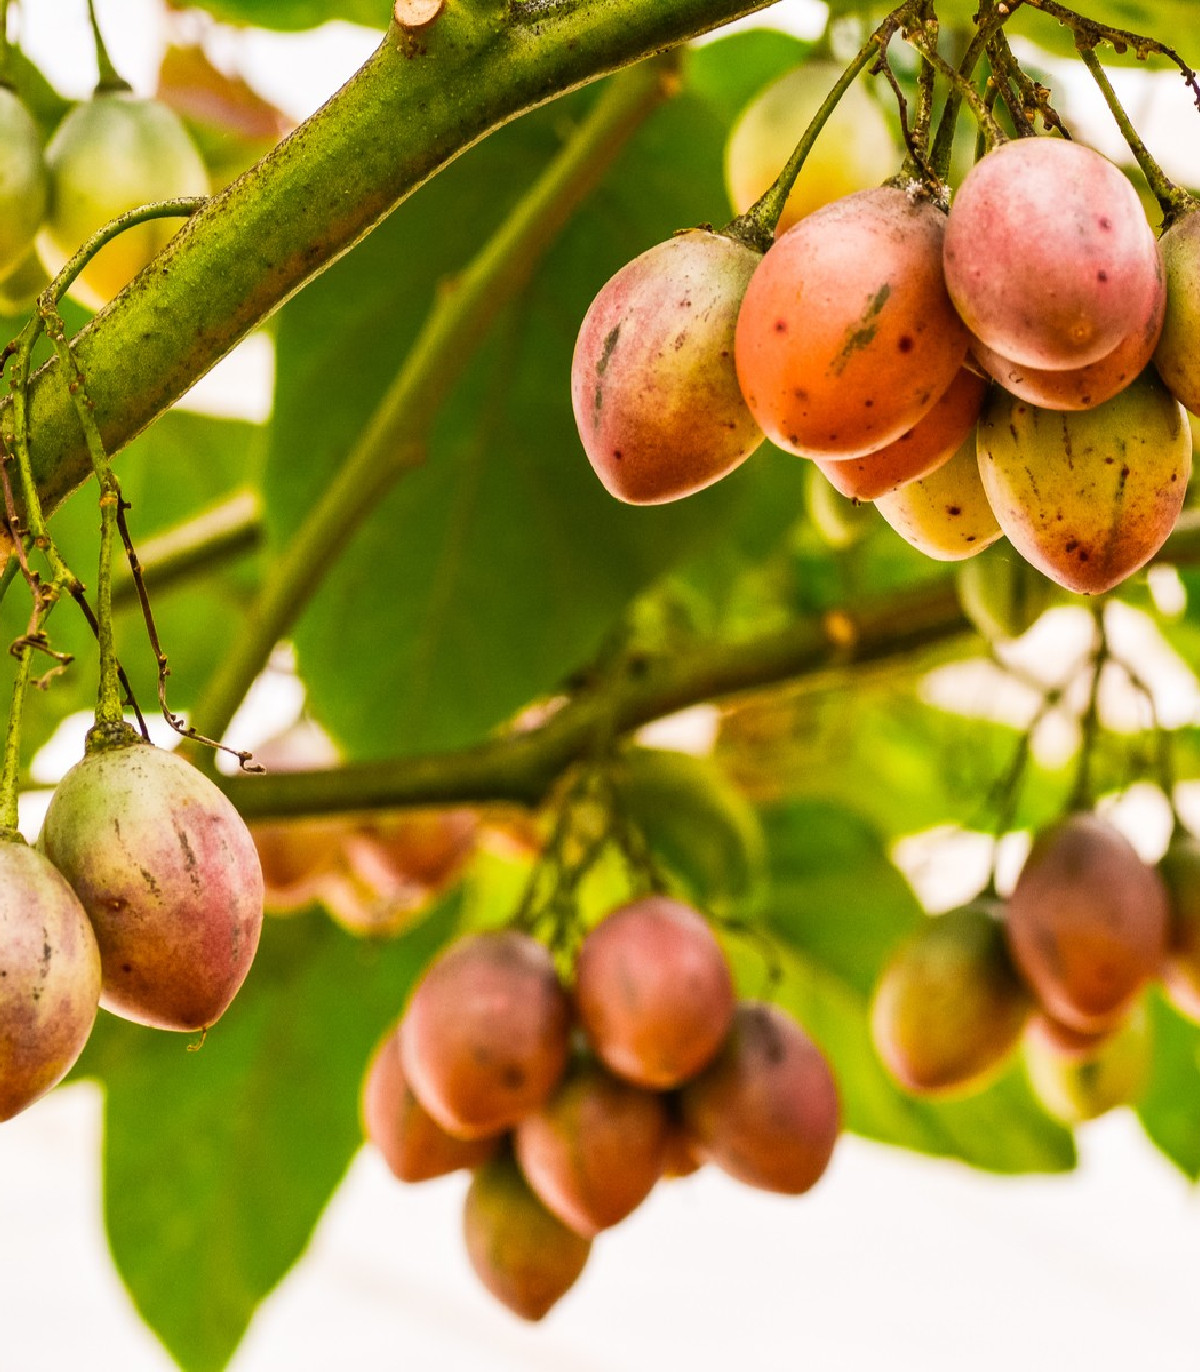 Paradajkový strom - Tamarillo - Cyphomandra betacea - semená tamarilla - 5 ks